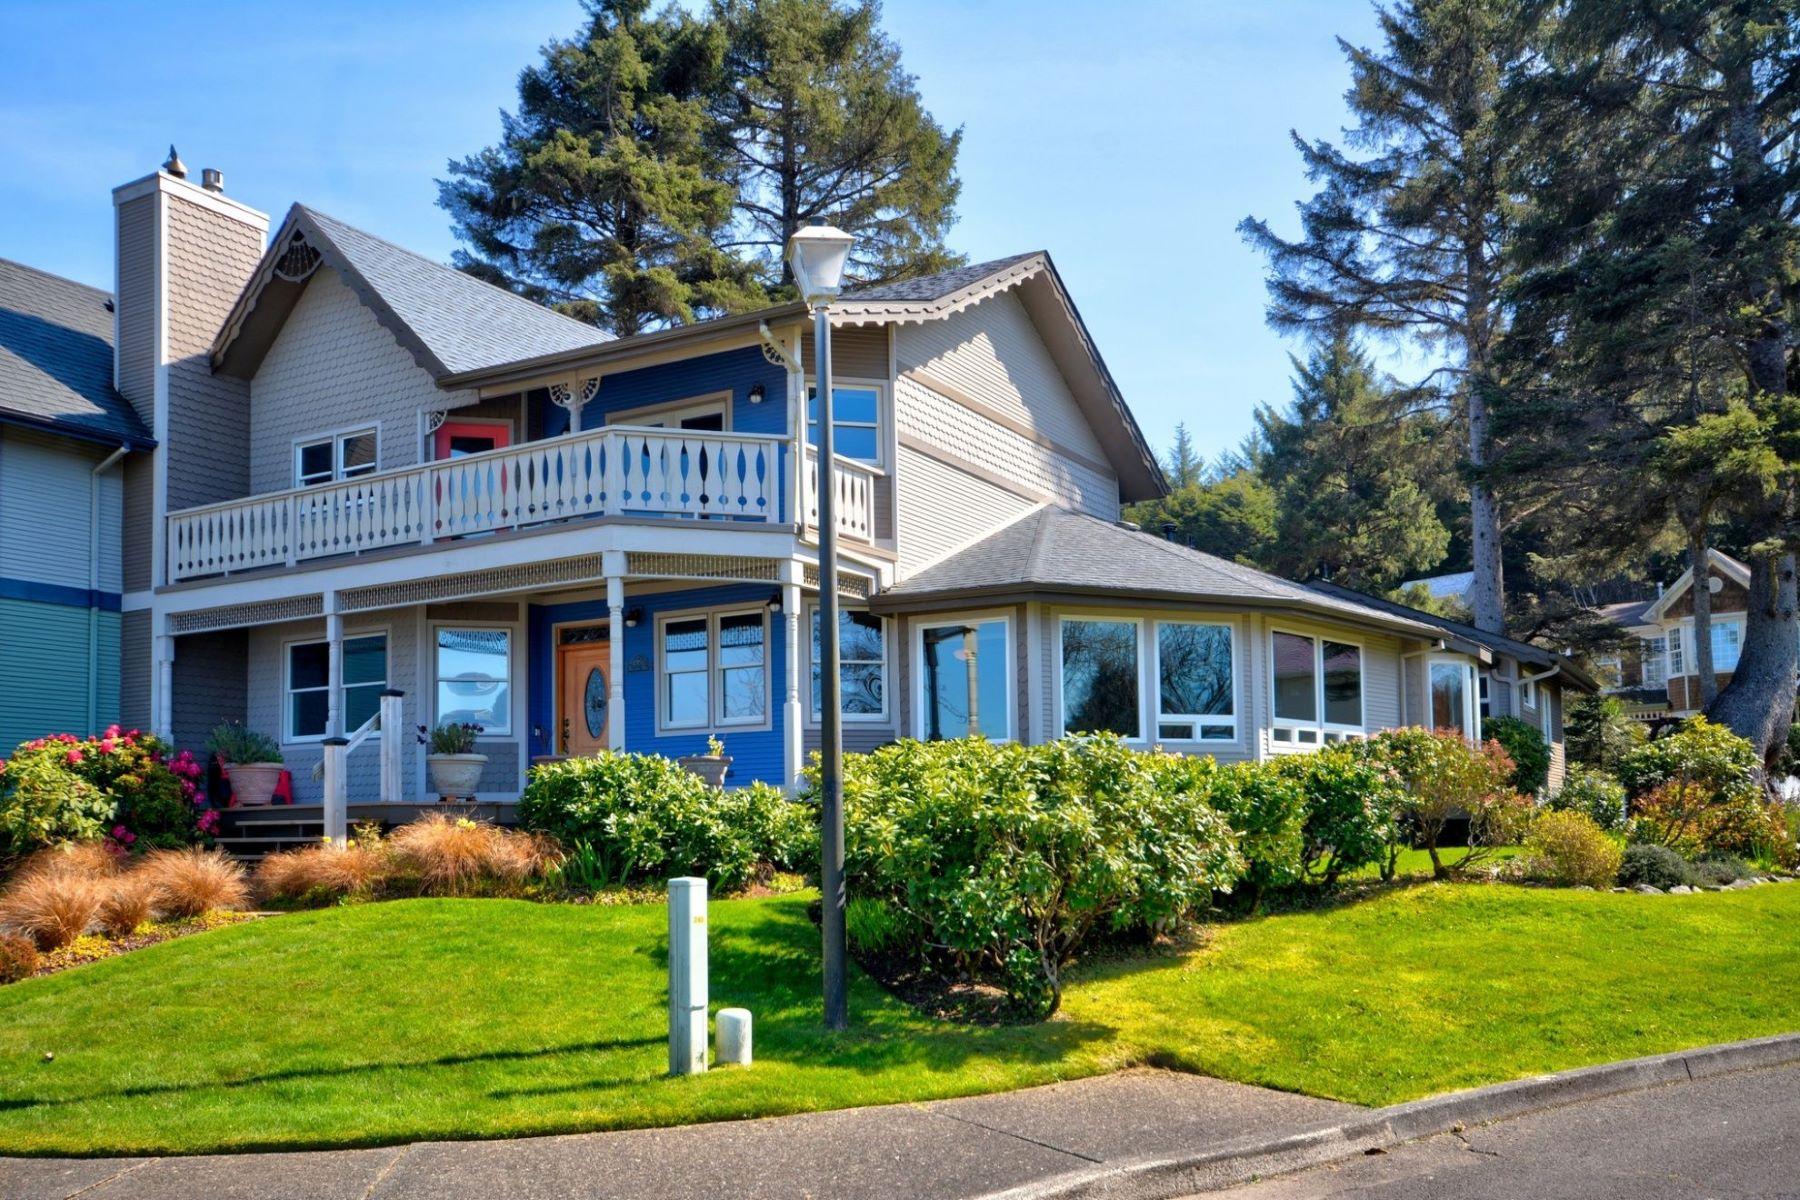 Single Family Homes for Active at 2952 Keepsake DR Seaside, OR 97138 2952 Keepsake DR Seaside, Oregon 97138 United States